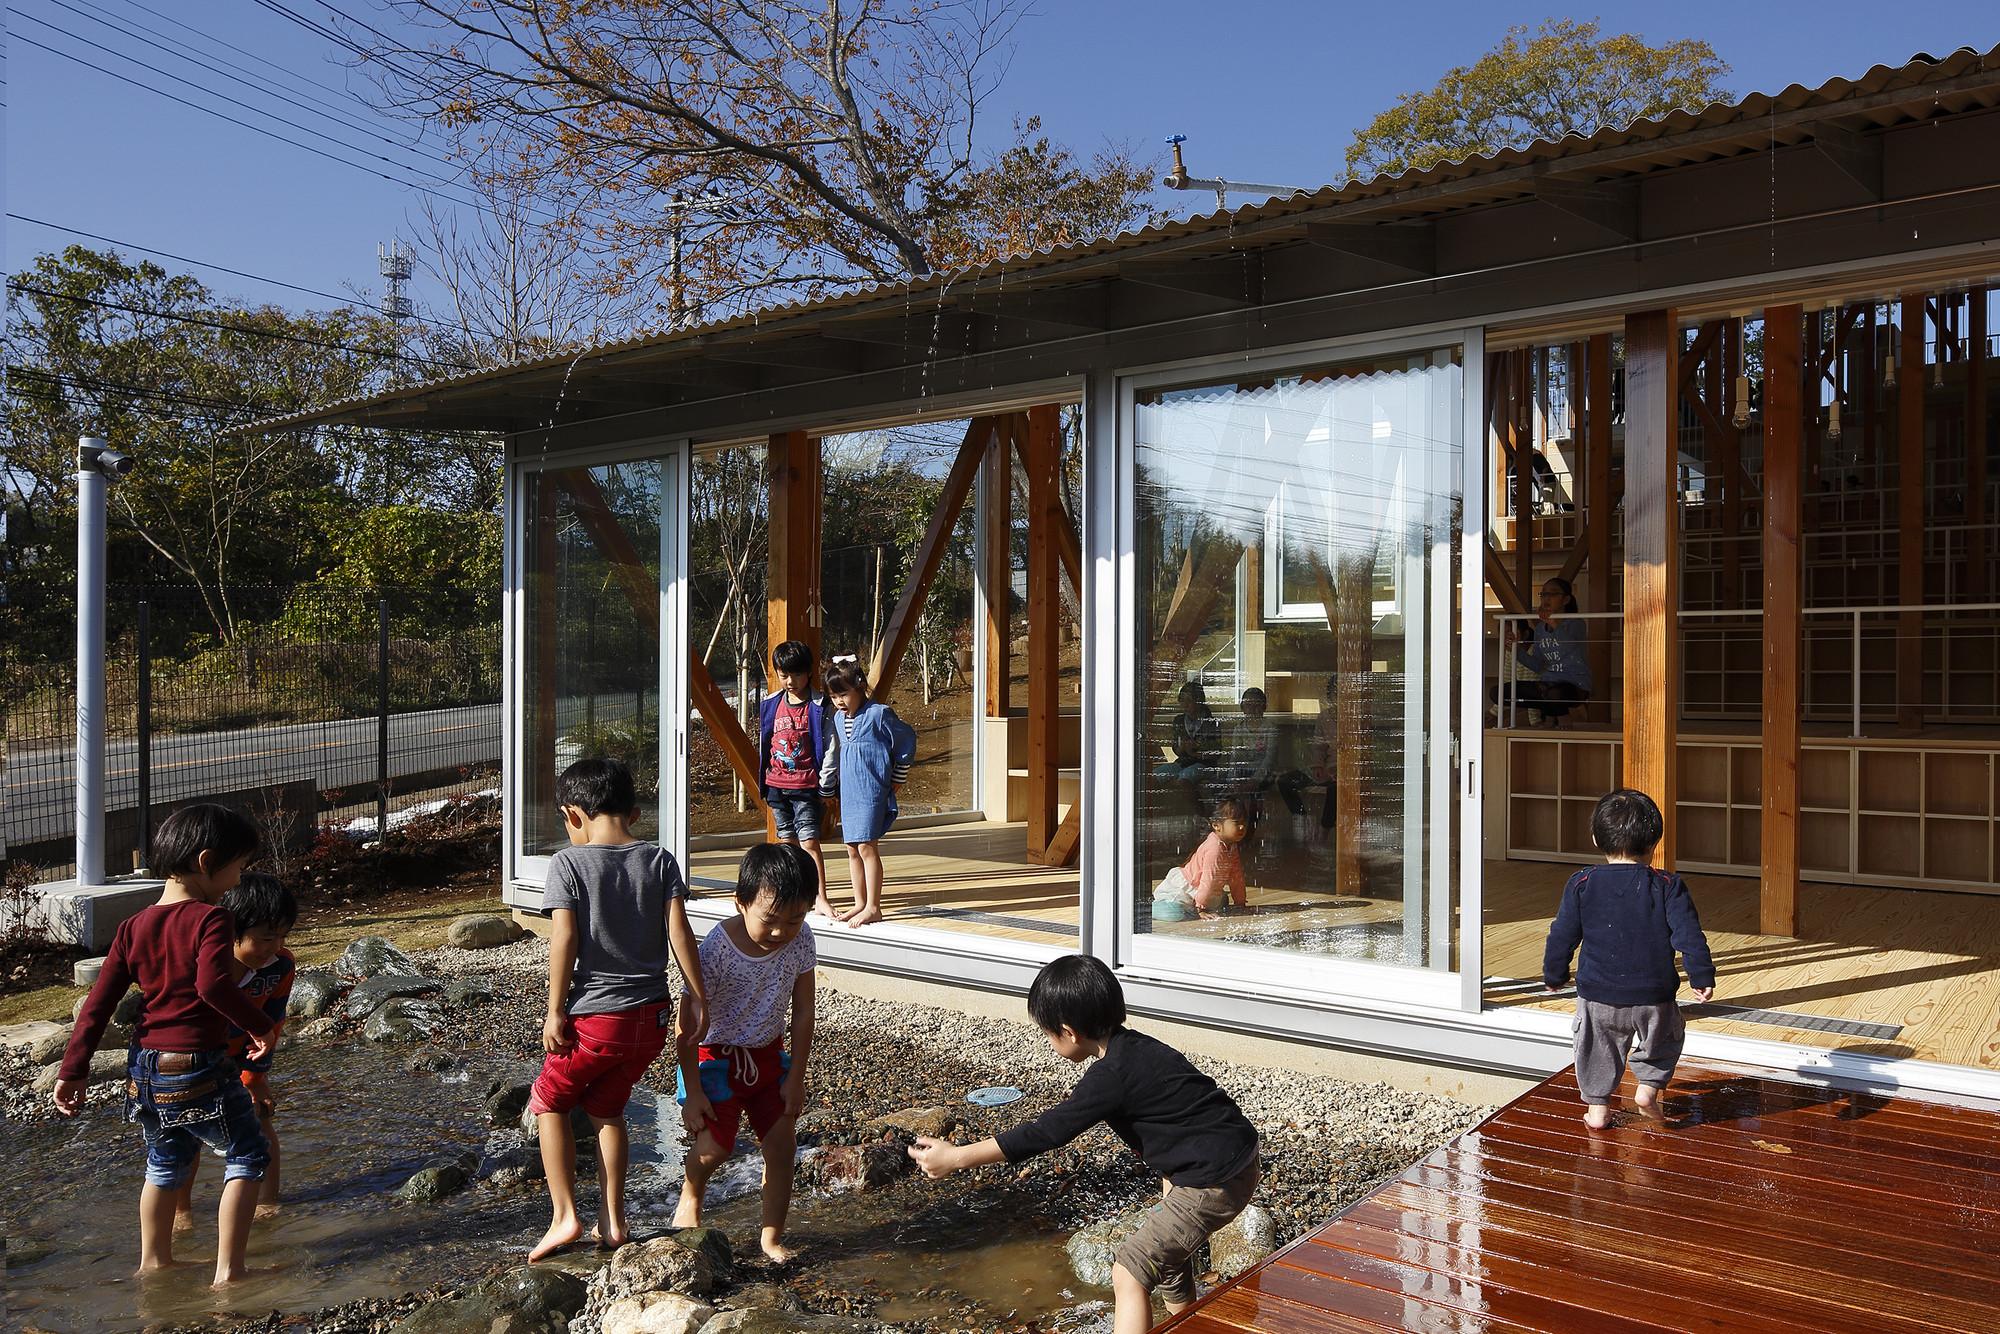 Architecture Design Workshop hakusui nursery school / yamazaki kentaro design workshop | archdaily